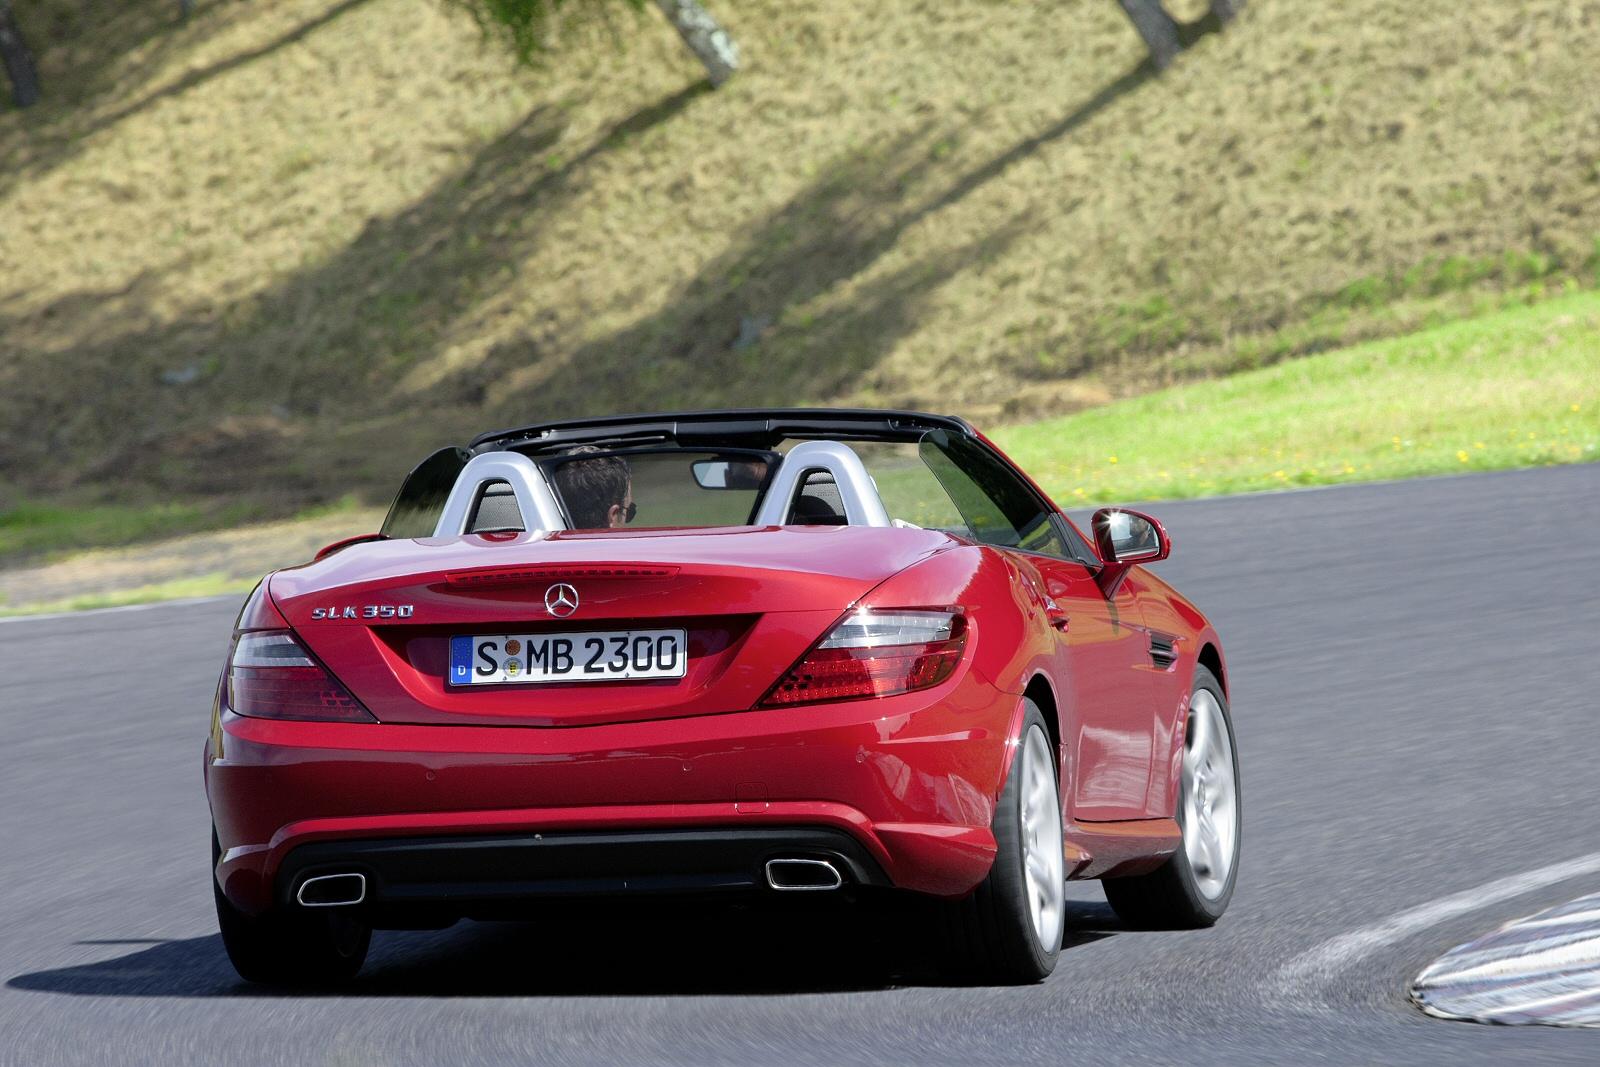 Mercedes slk class finance and leasing deals osv ltd for Mercedes benz financing specials